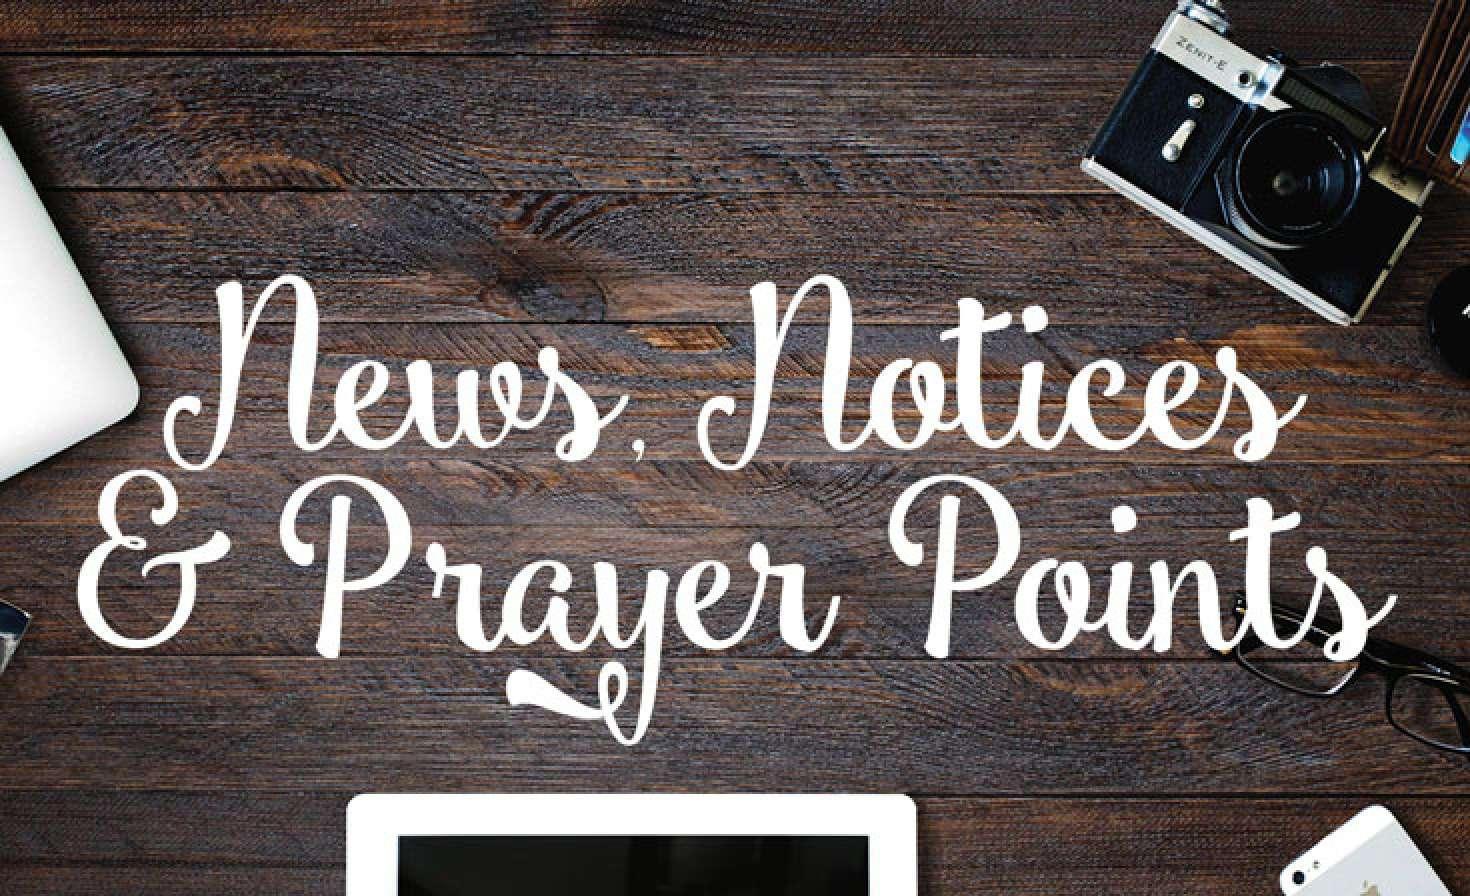 UCA SA - News, Notices & Prayer points - 23 January, 2019